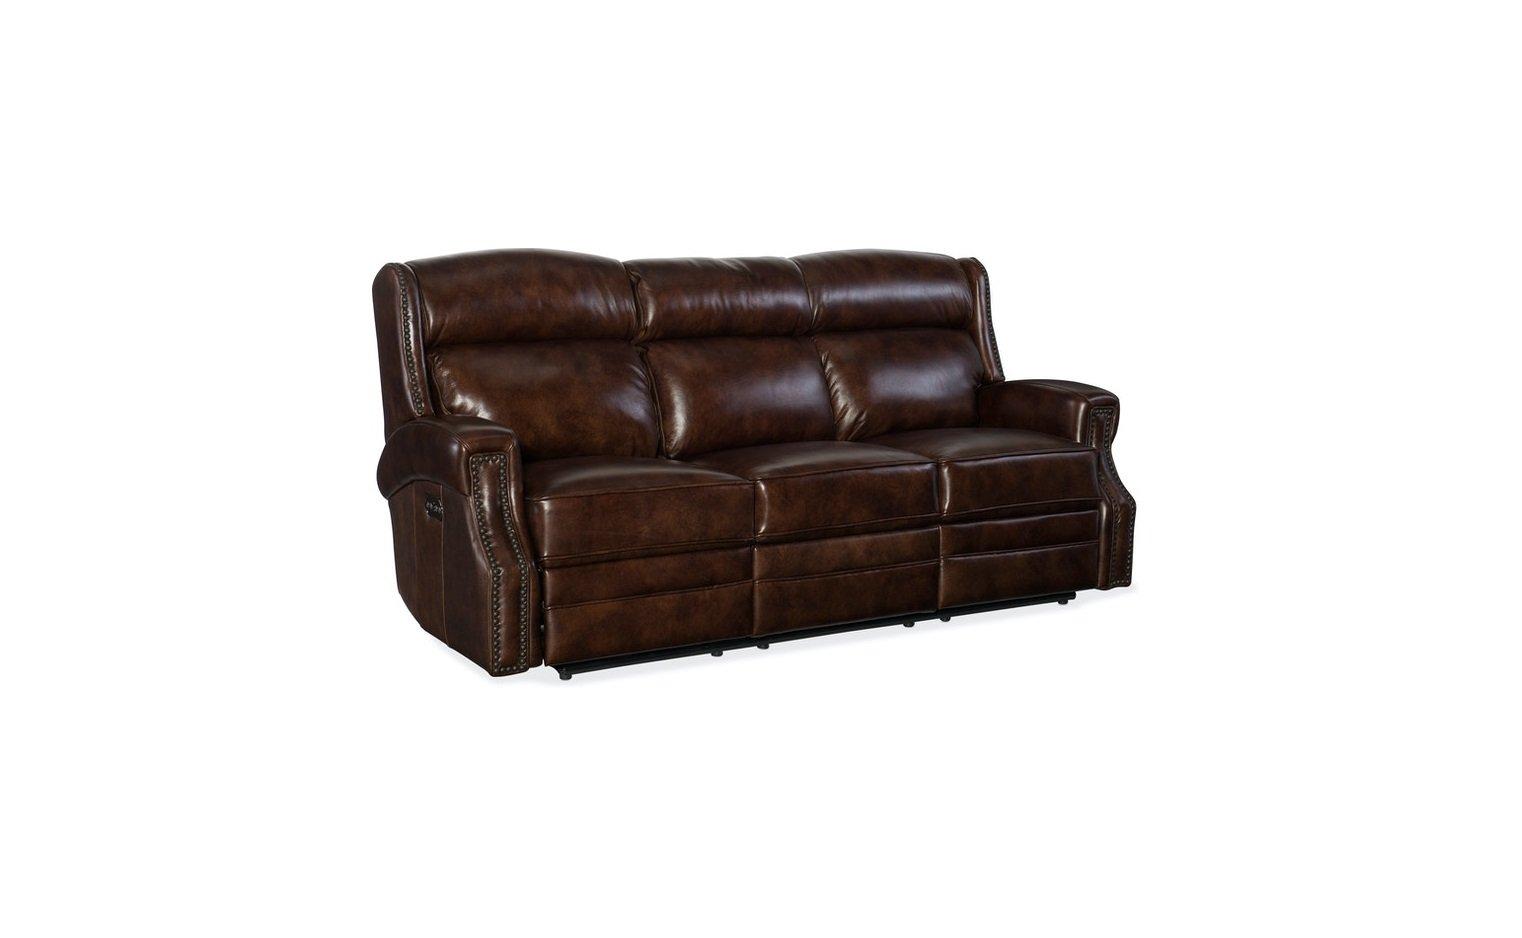 Hooker Furniture Living Room Carlisle Power Recliner Sofa w/ Power Headrest